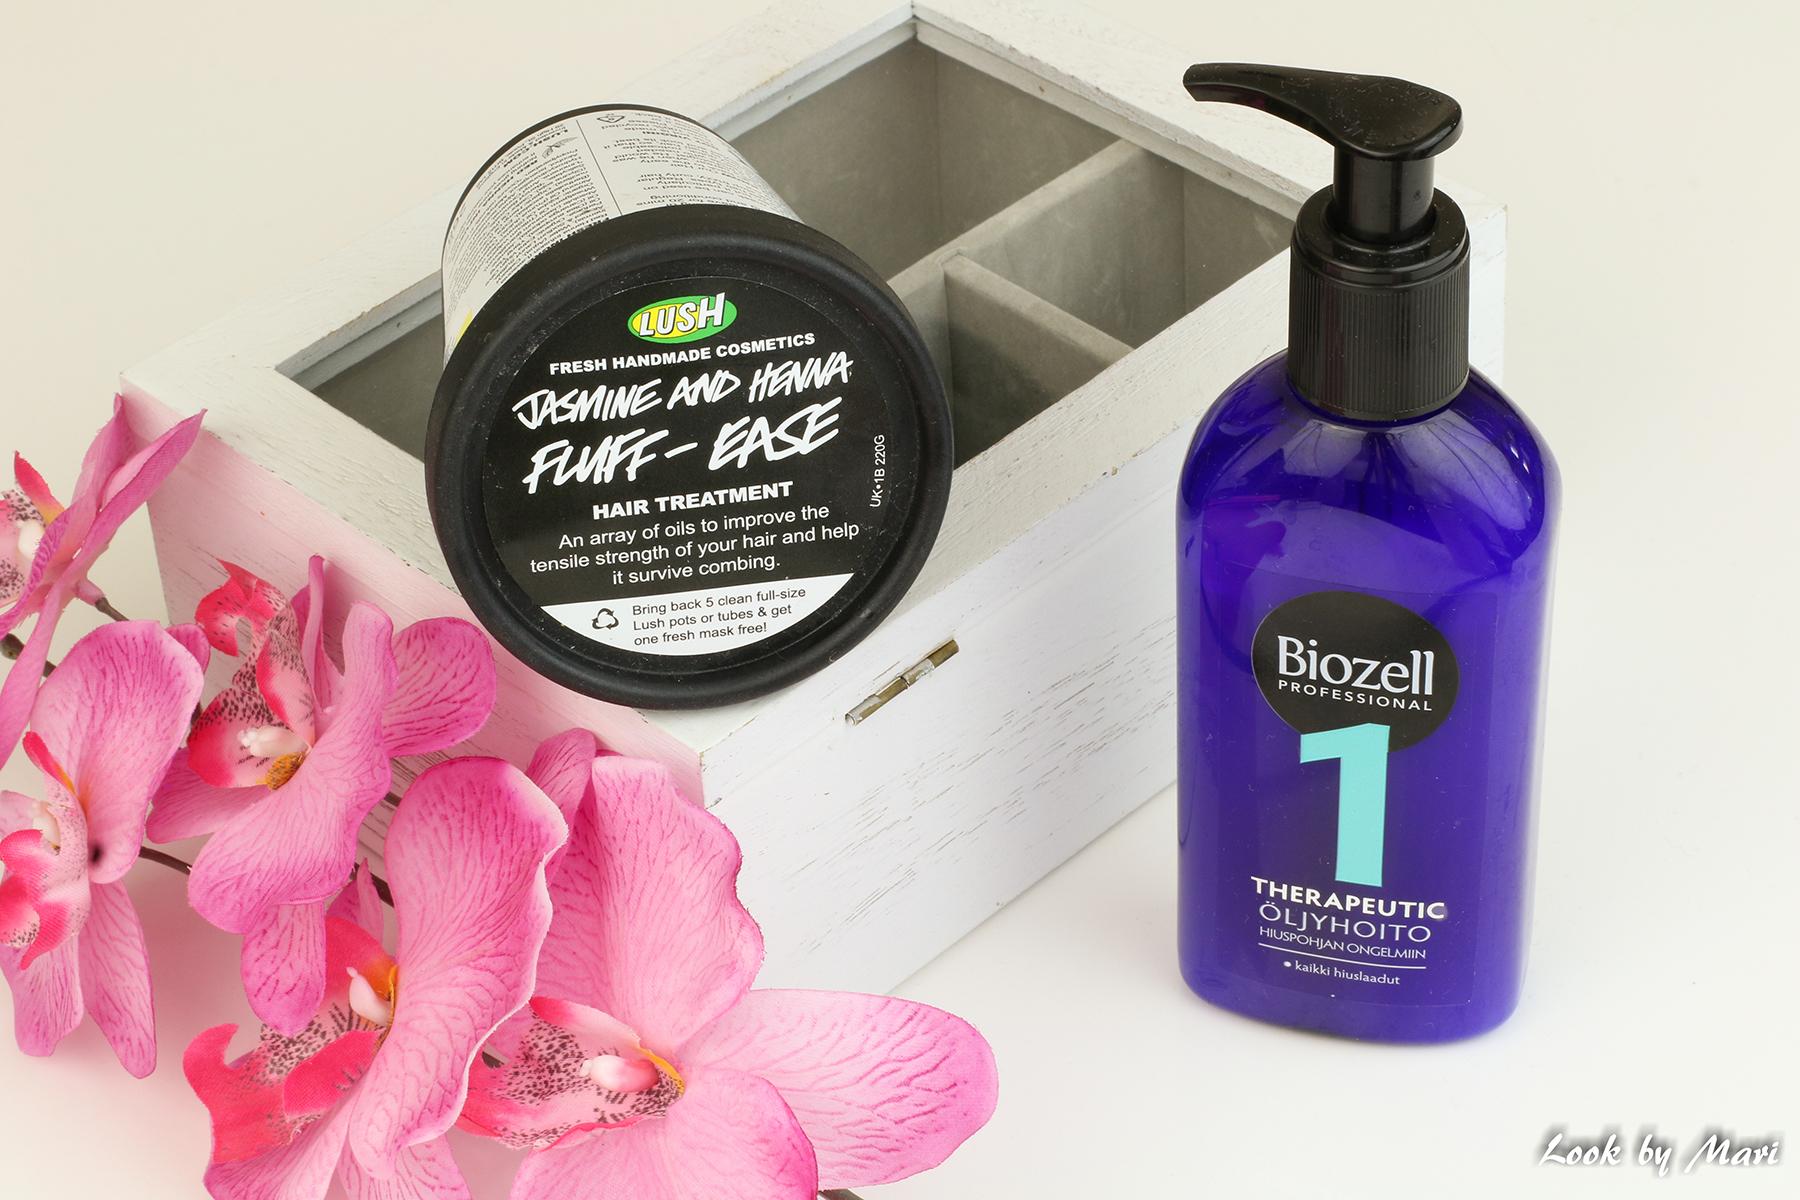 6 lush jasmine & henna fluff easy hair treatment kokemuksia review